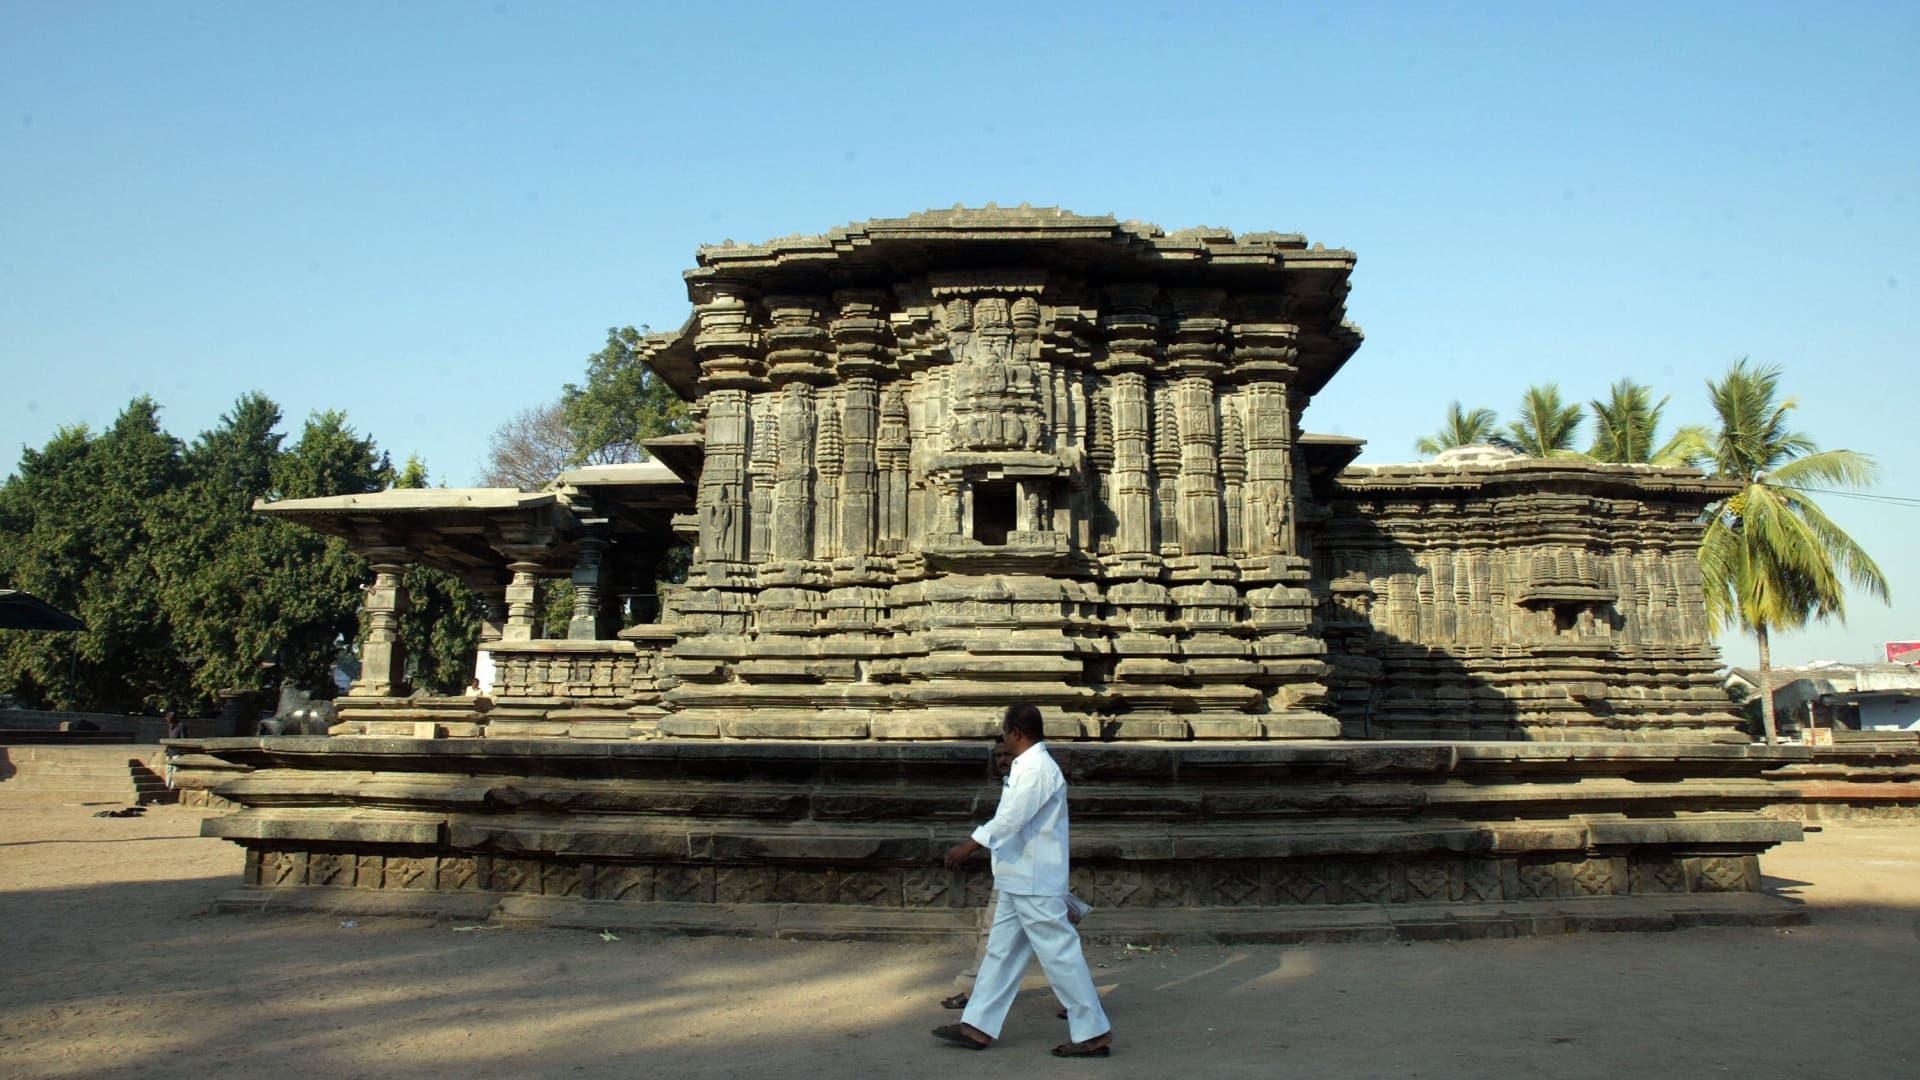 The Kakatiya Rudreshwara Temple in India.